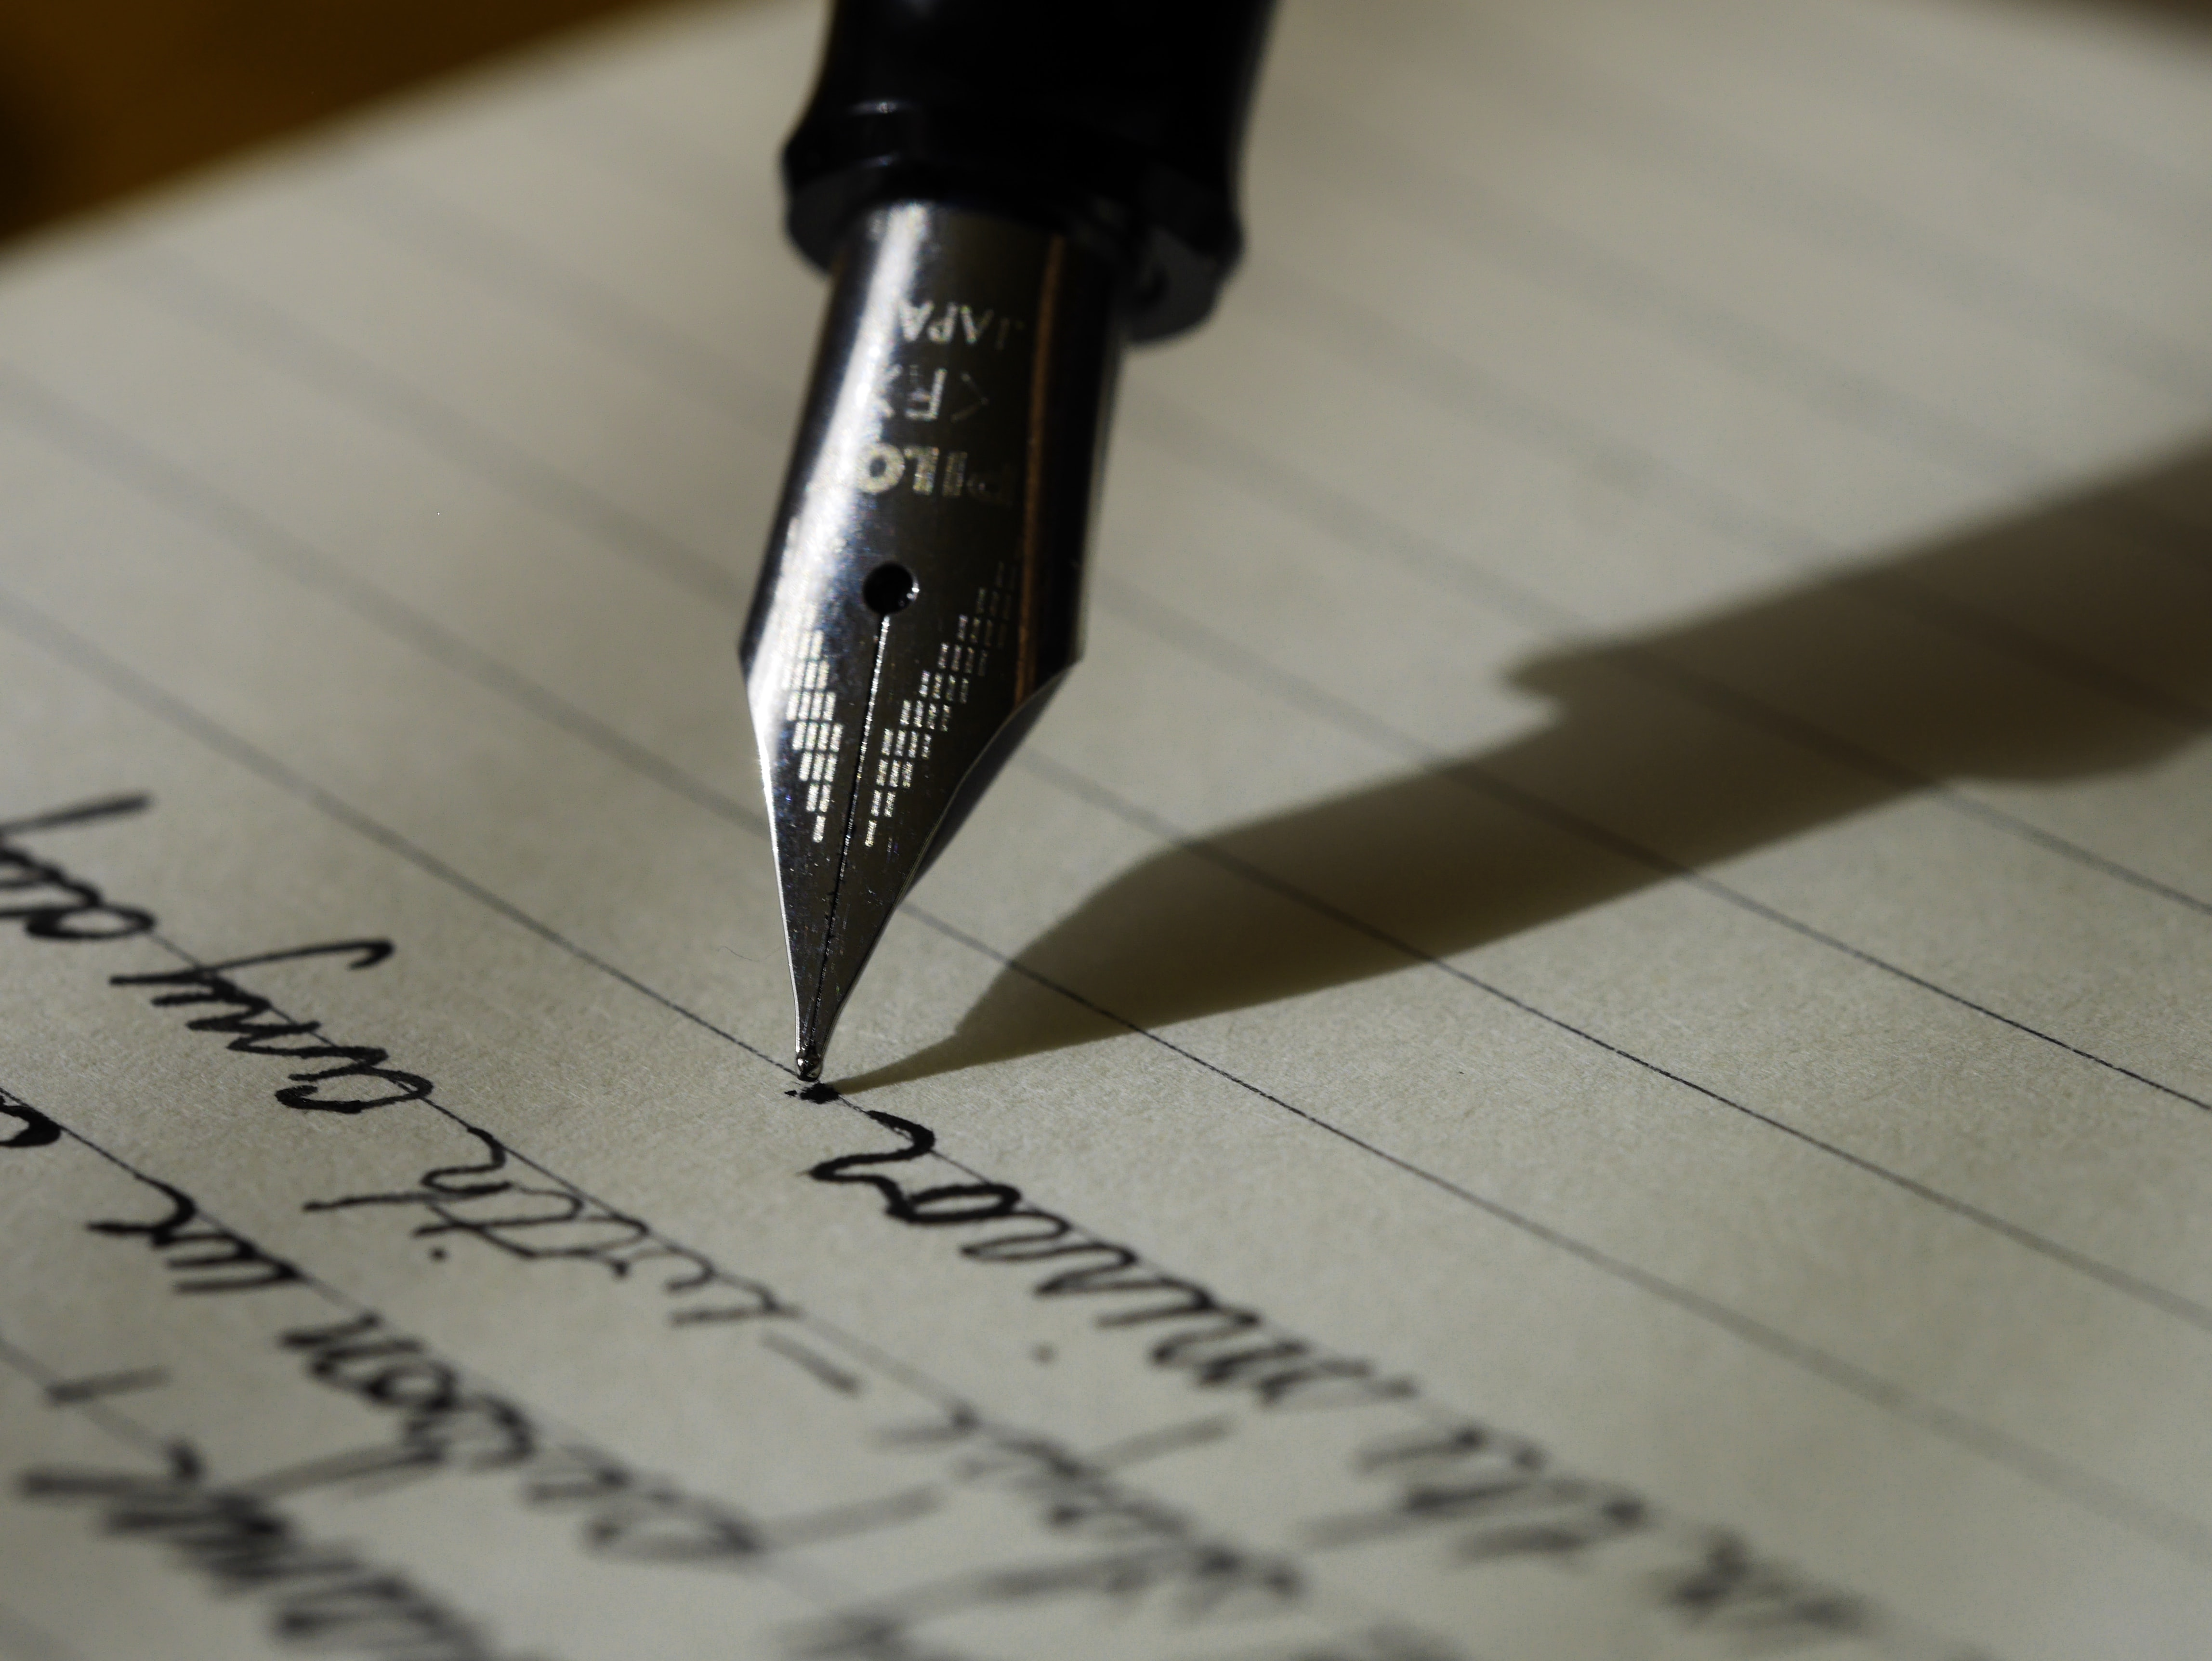 10 Contoh Paragraf Deduktif Dan Induktif Berbagai Keperluan Lengkap Mamikos Info